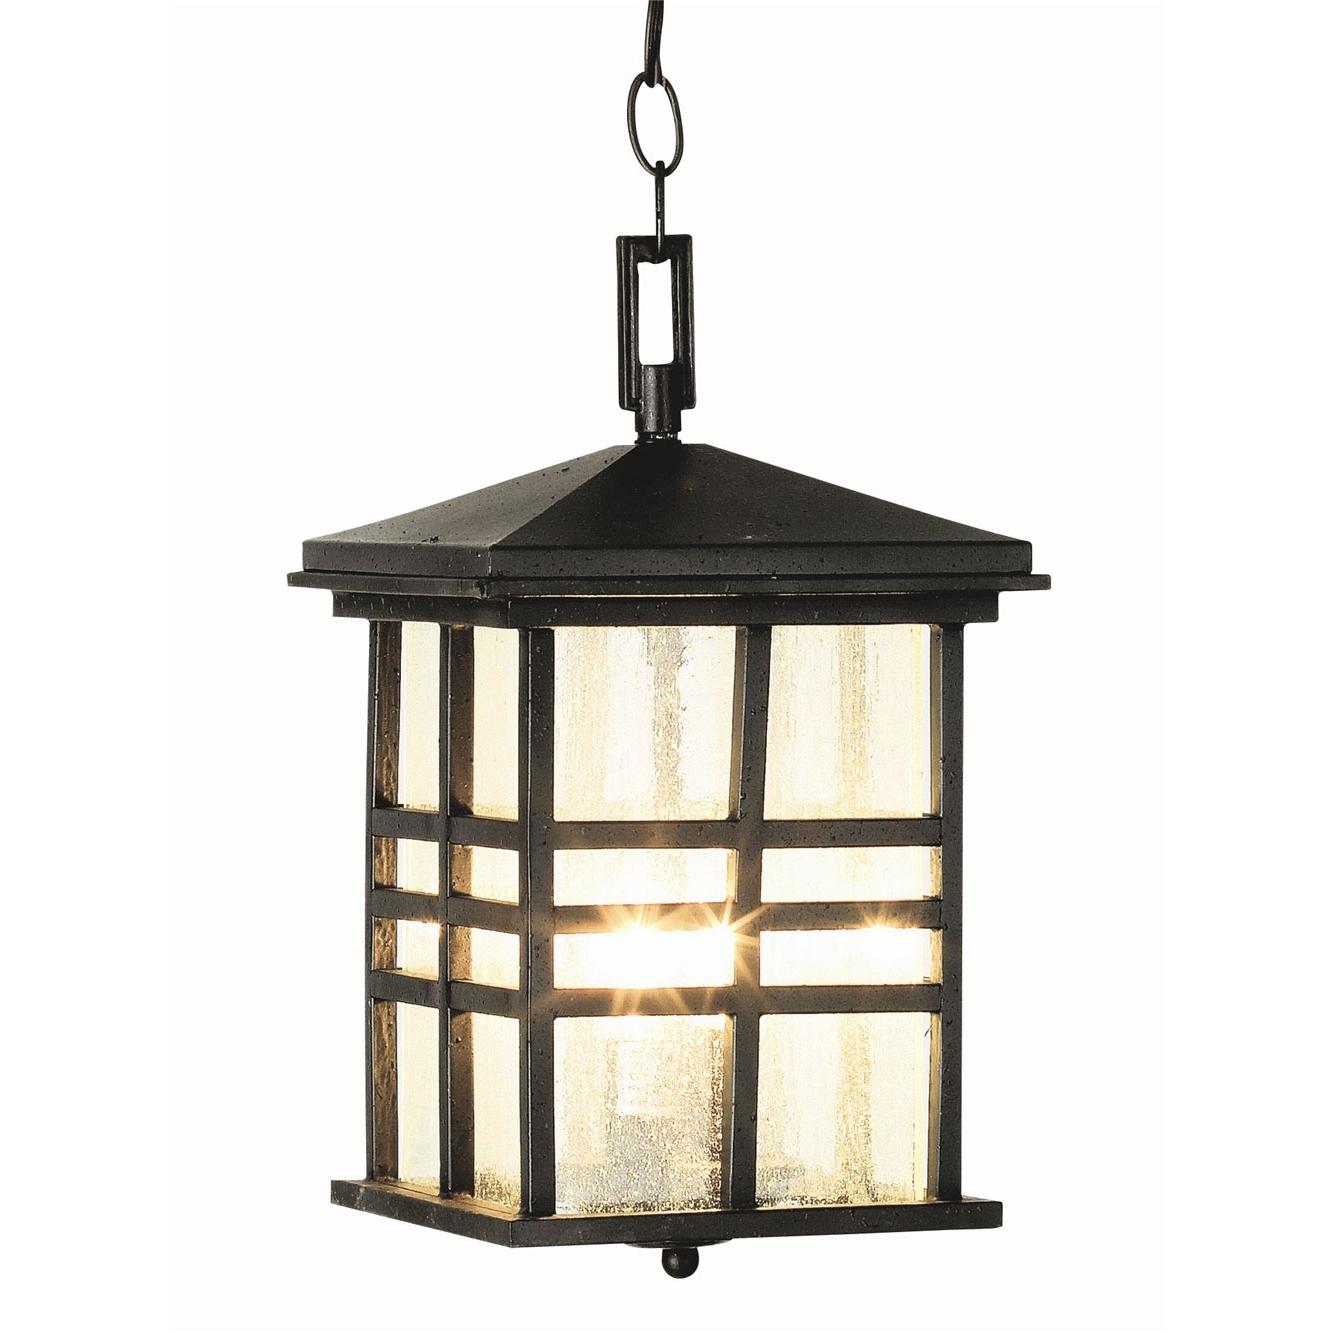 Rustic Craftsman Outdoor Hanging Lanterntrans Globe (View 17 of 20)